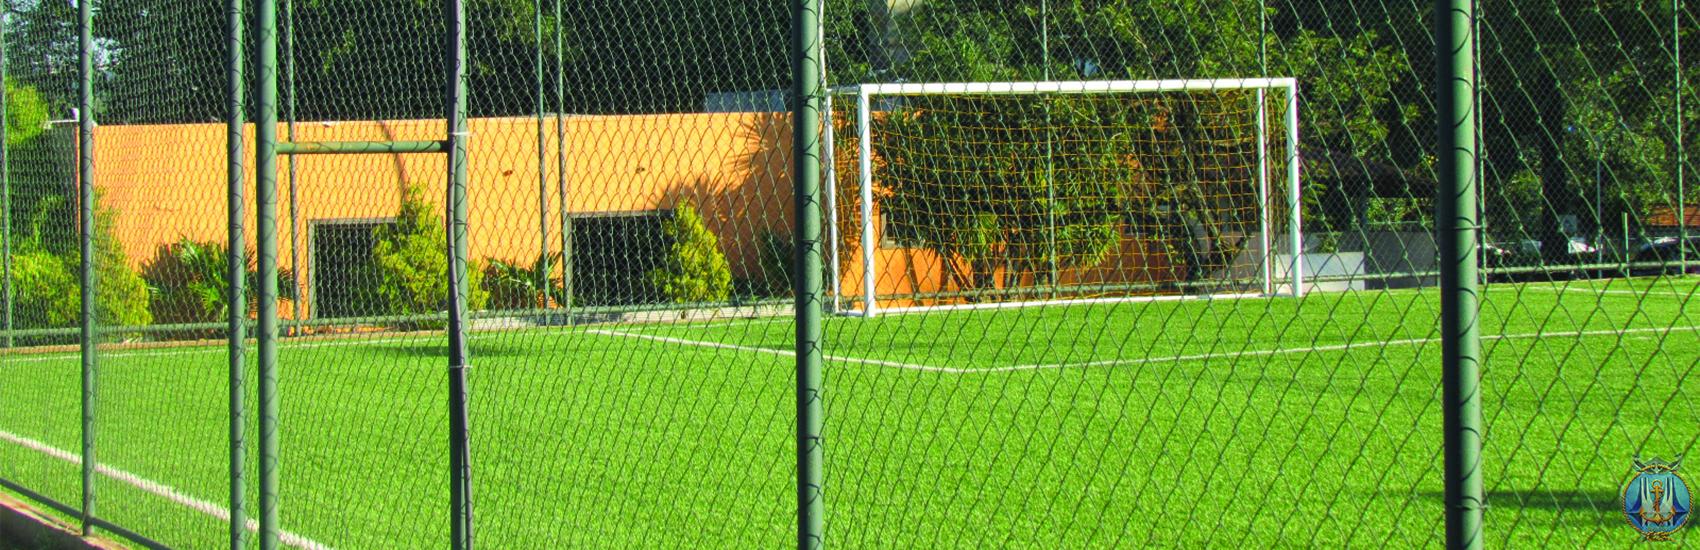 campo-futebol1